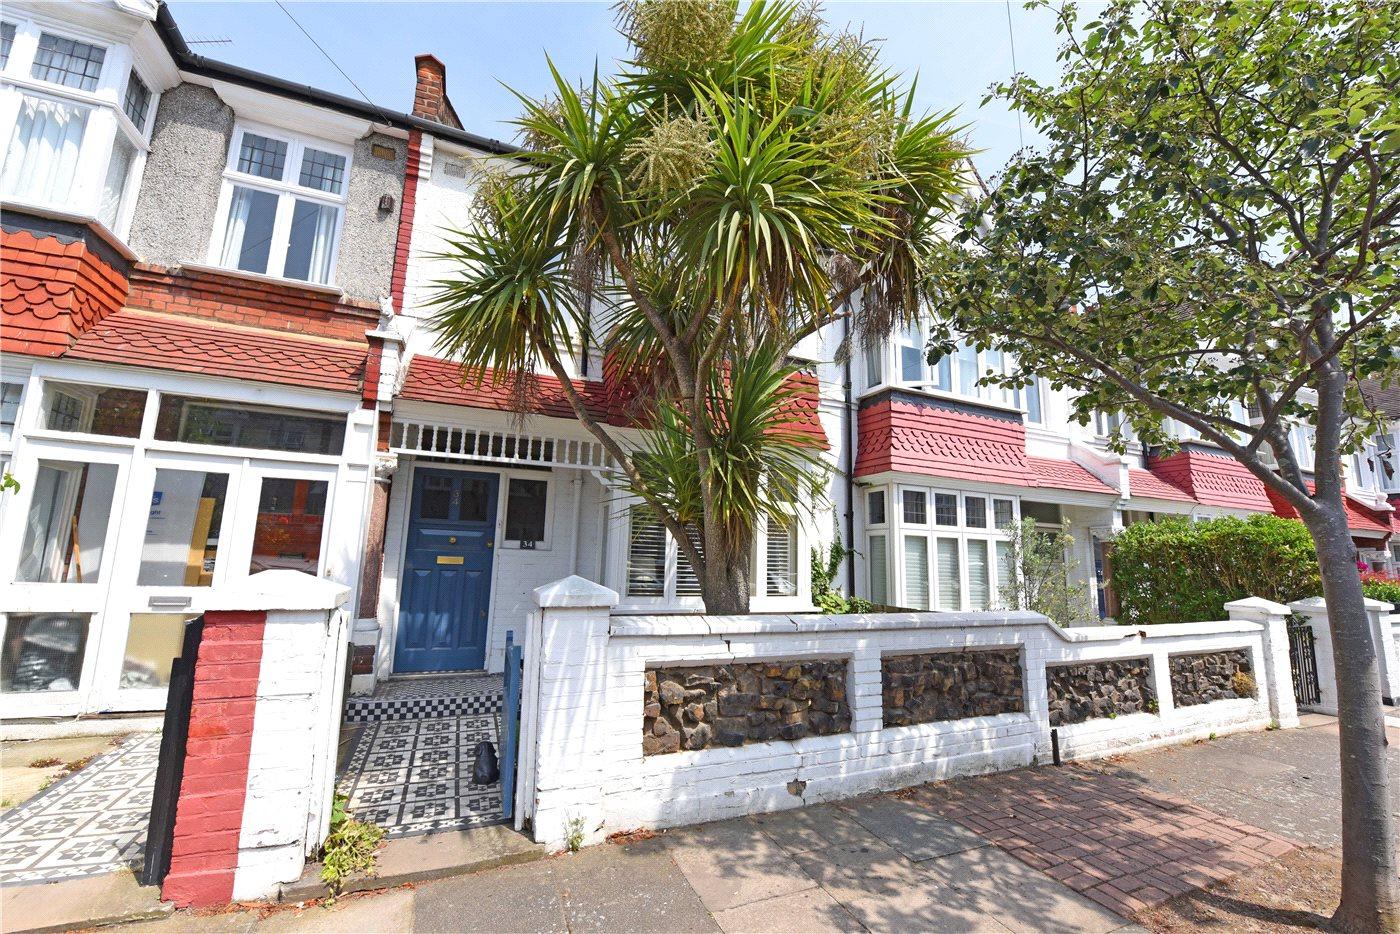 4 Bedroom Property For Sale In Hambledon Road Southfields